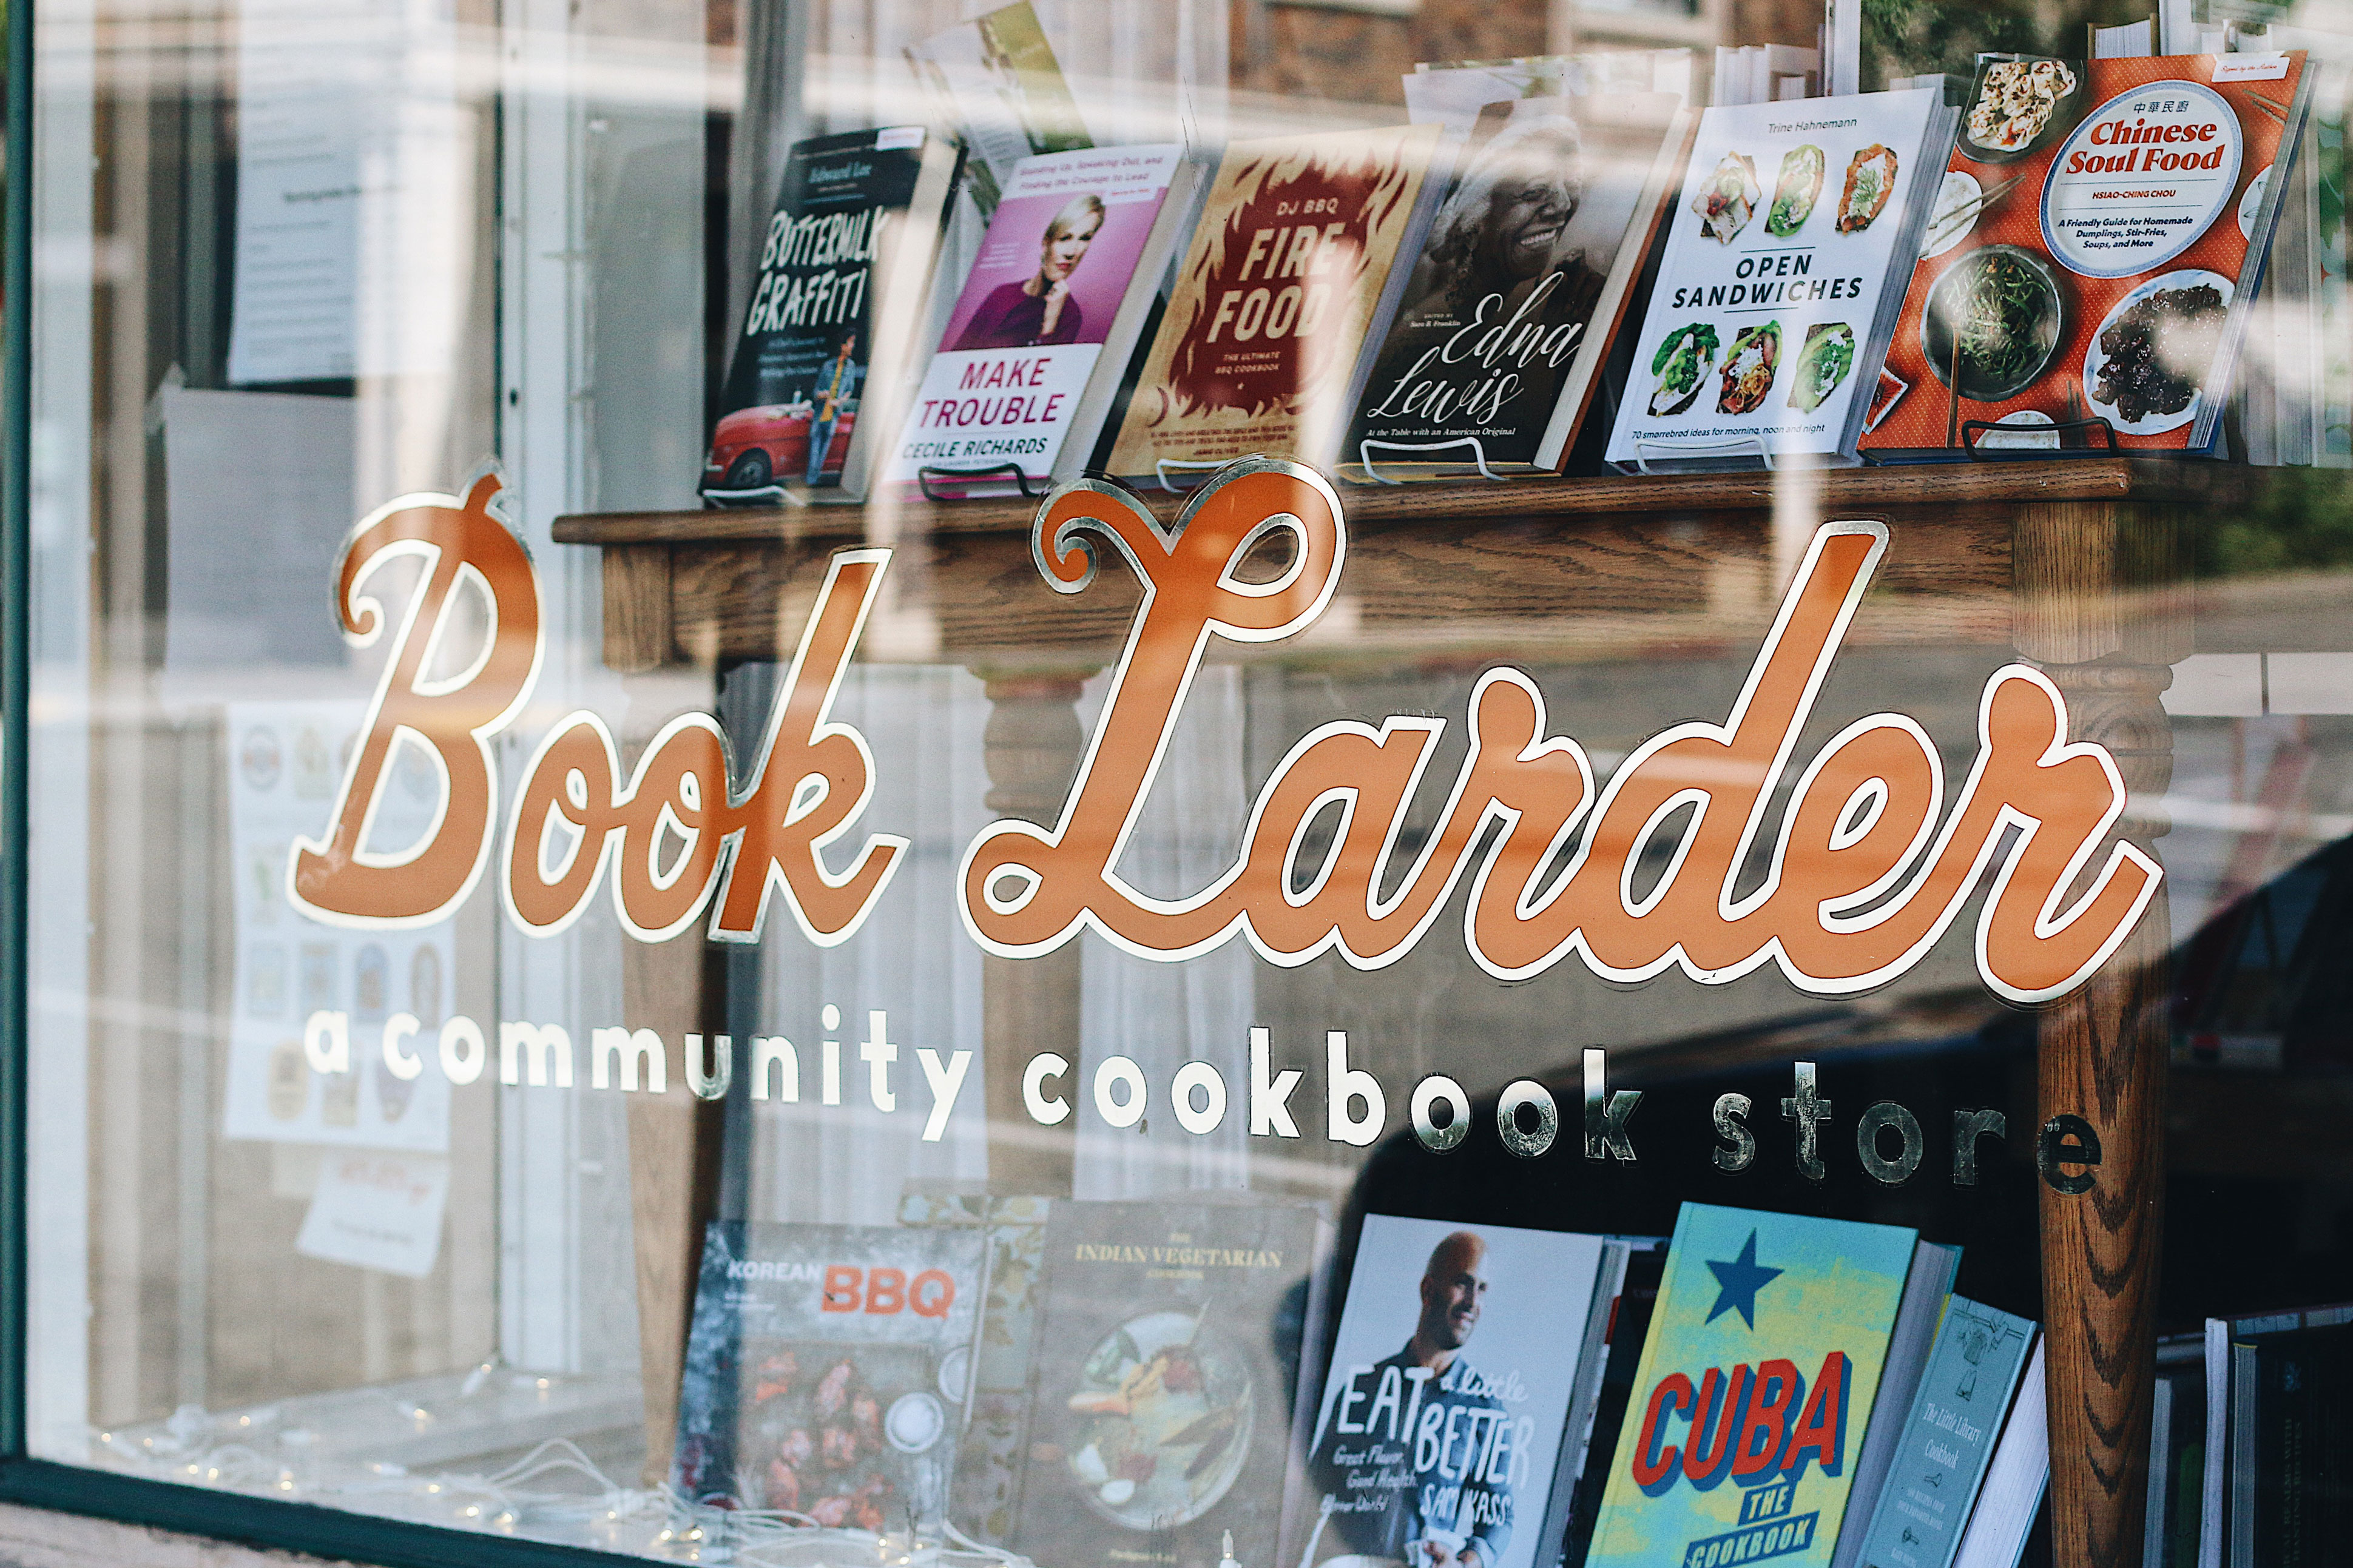 seattle-book-larder-cookbook-store-